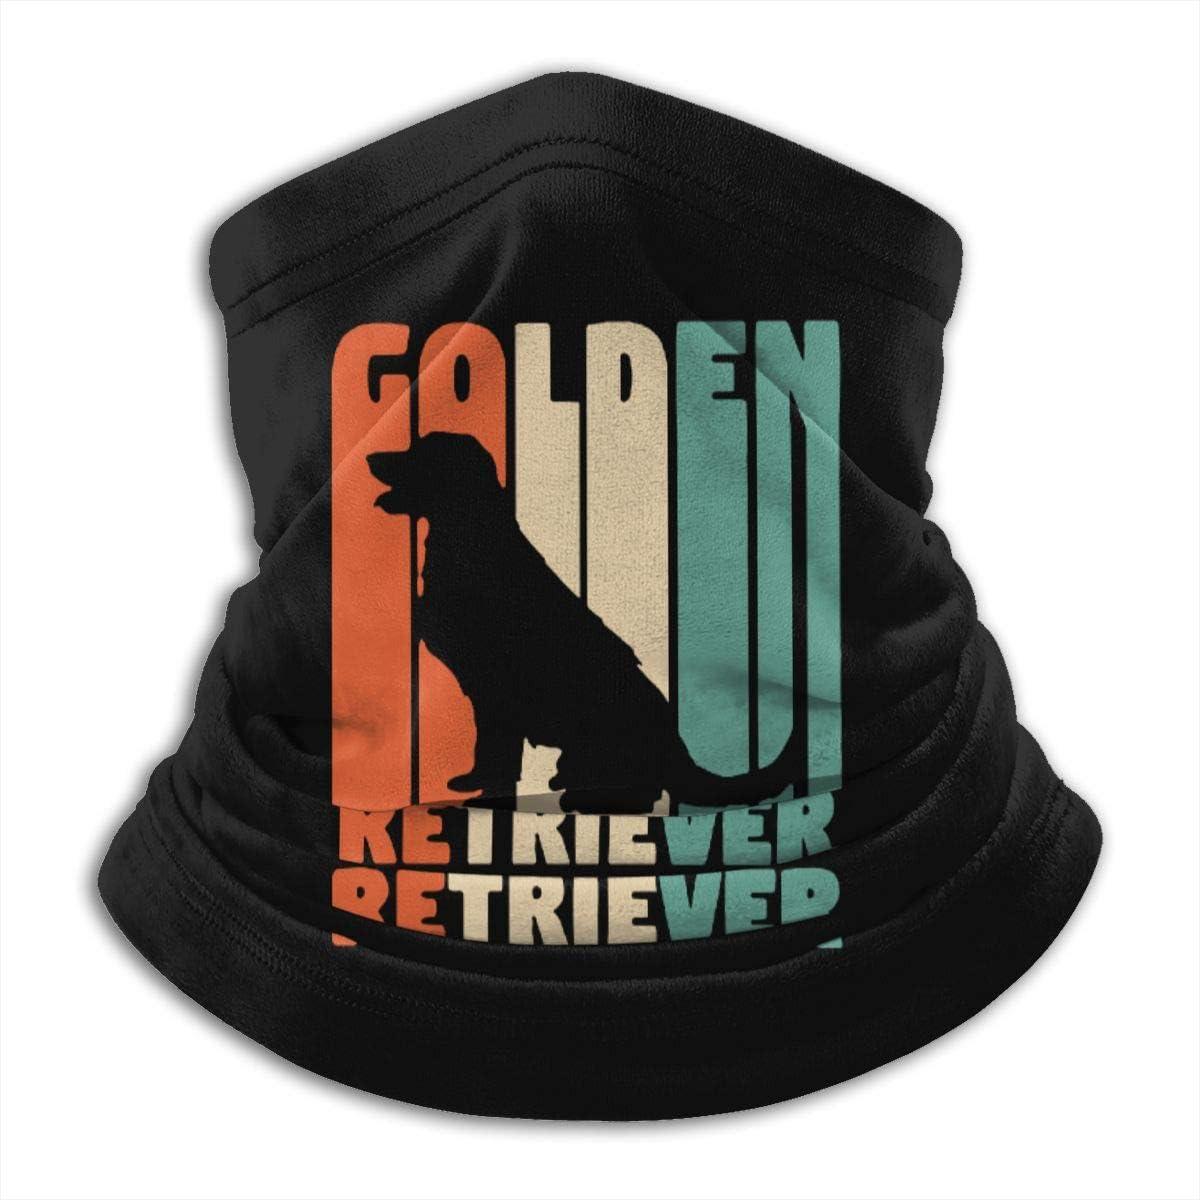 Golden Retriever Men /& Women Face Mask Windproof Neck Warmer Winter Neck Gaiter For Fishing Motorcycling